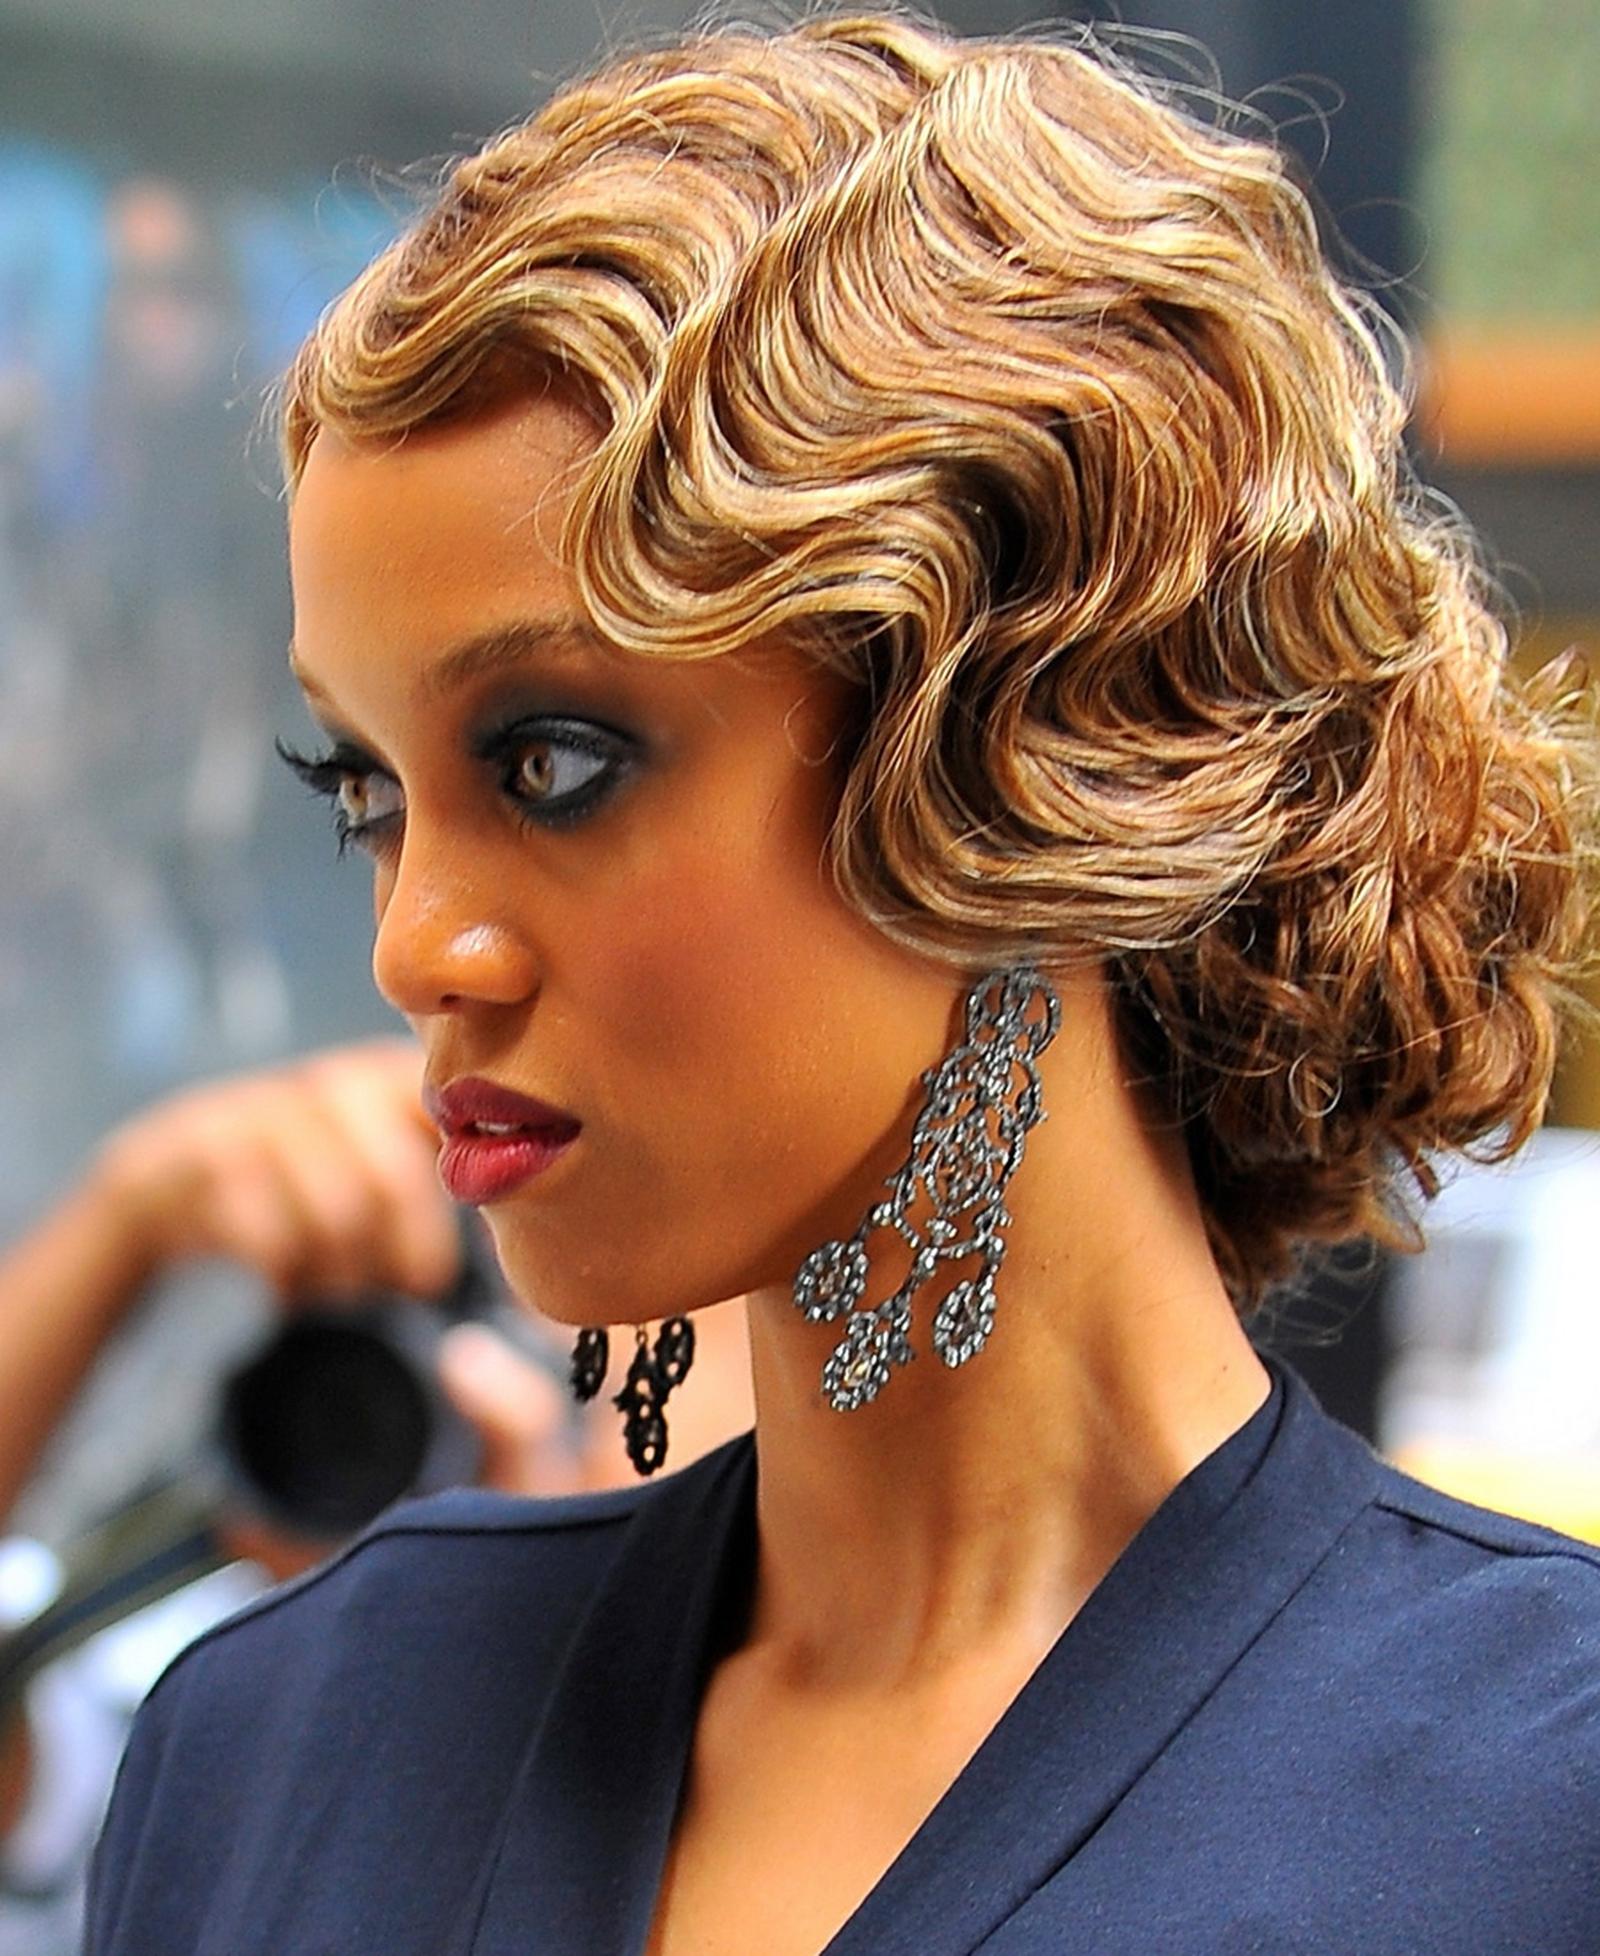 Tyra Banks hits Gossip Girl set